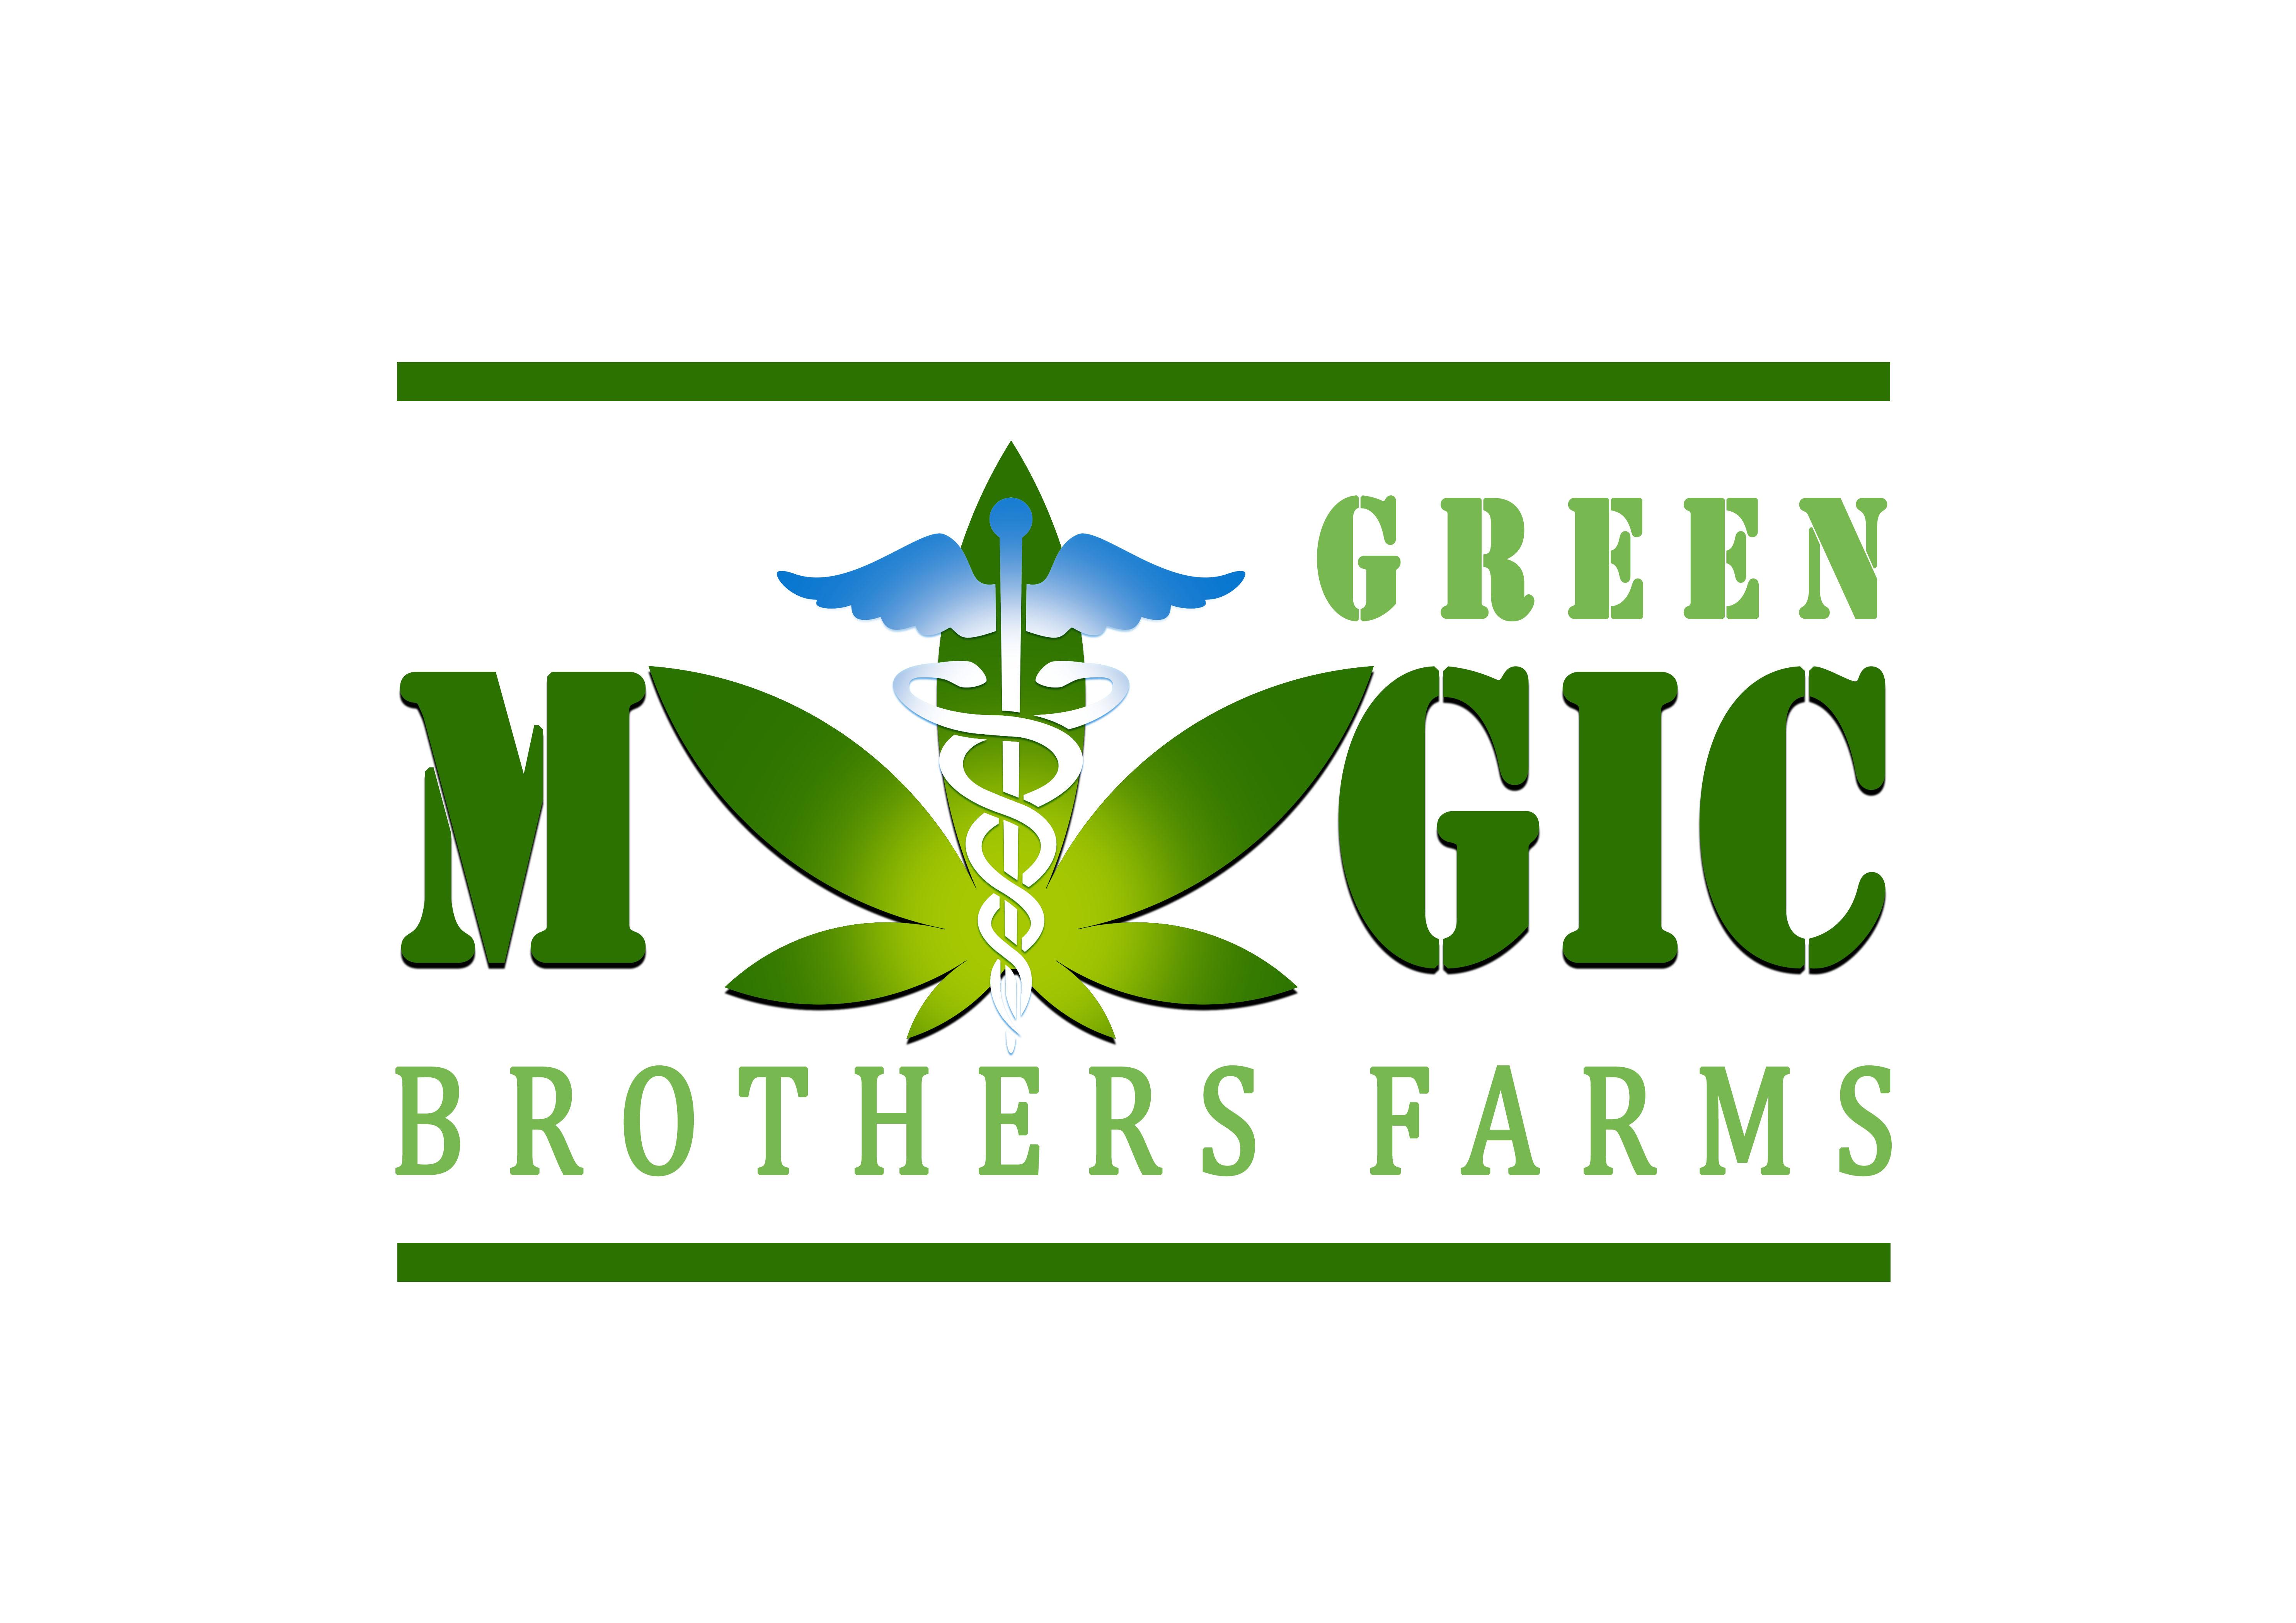 Logo Design by JR Cantos - Entry No. 66 in the Logo Design Contest Green Brothers Farm Logo Design.